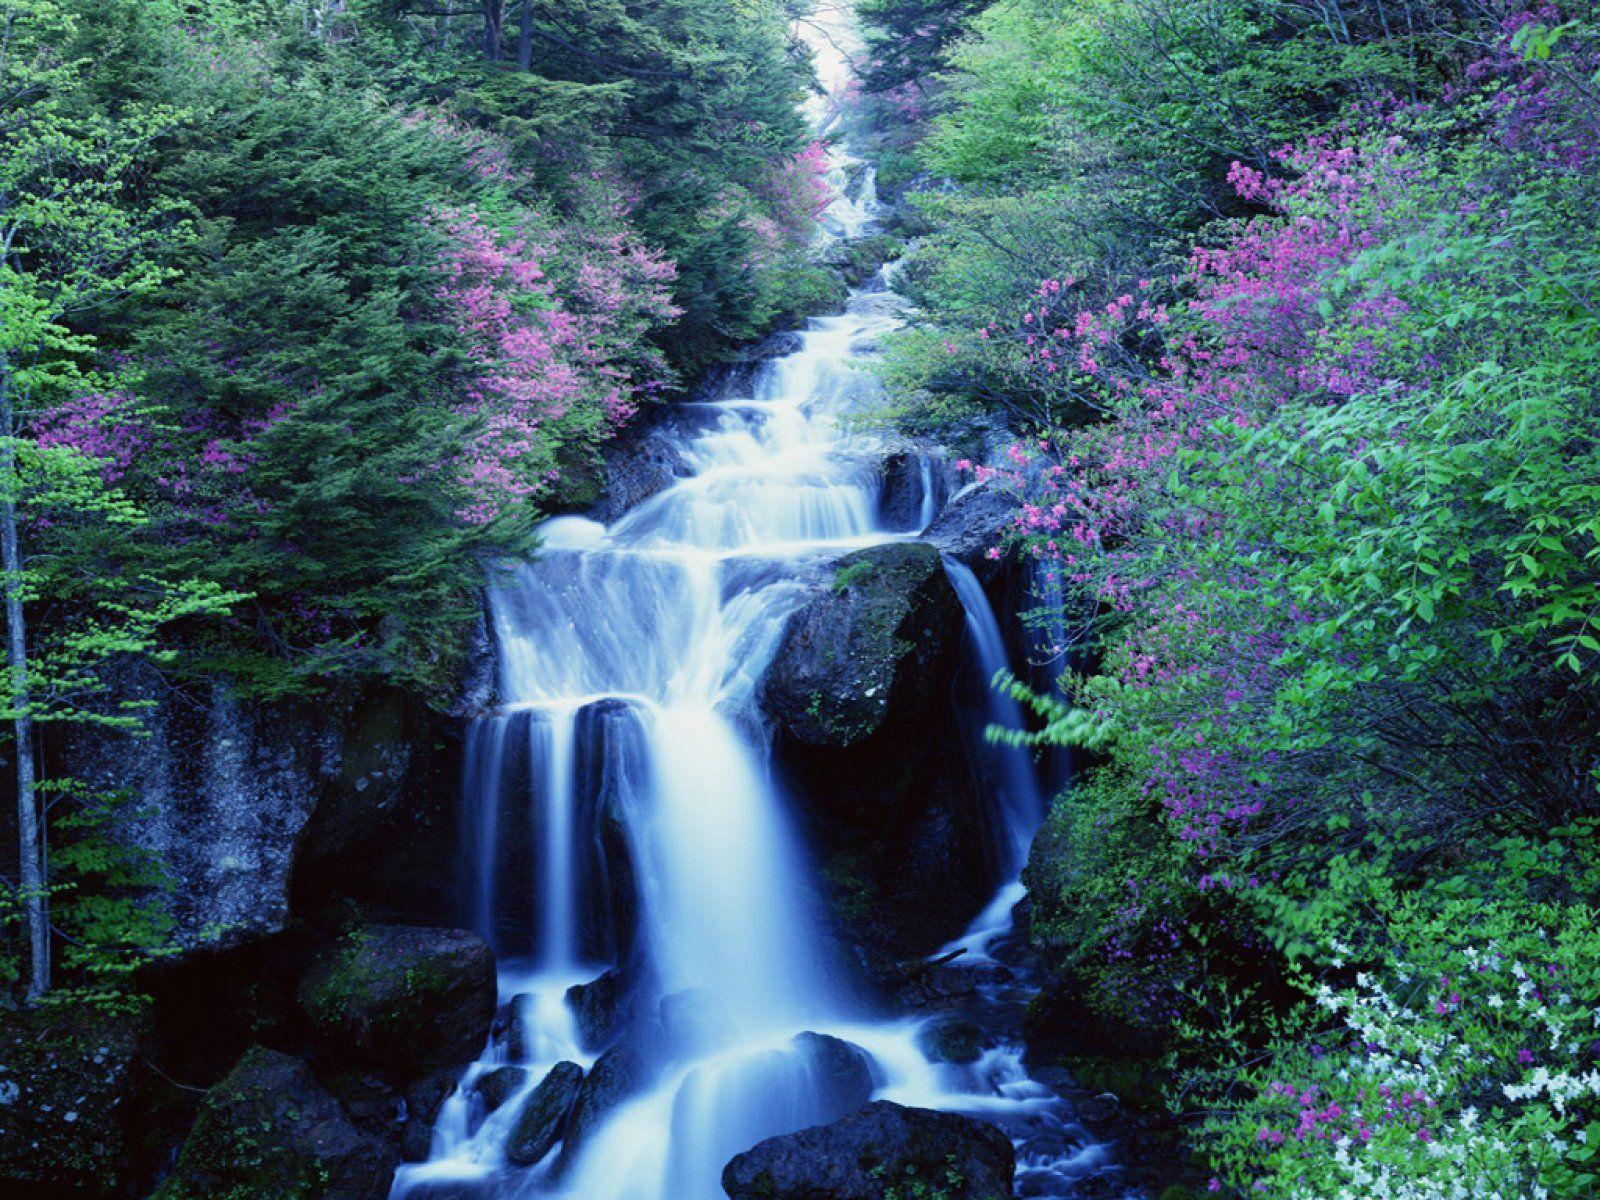 waterfalls pictures for screensavers free blue waterfalls nature vistas computer desktop wallpapers